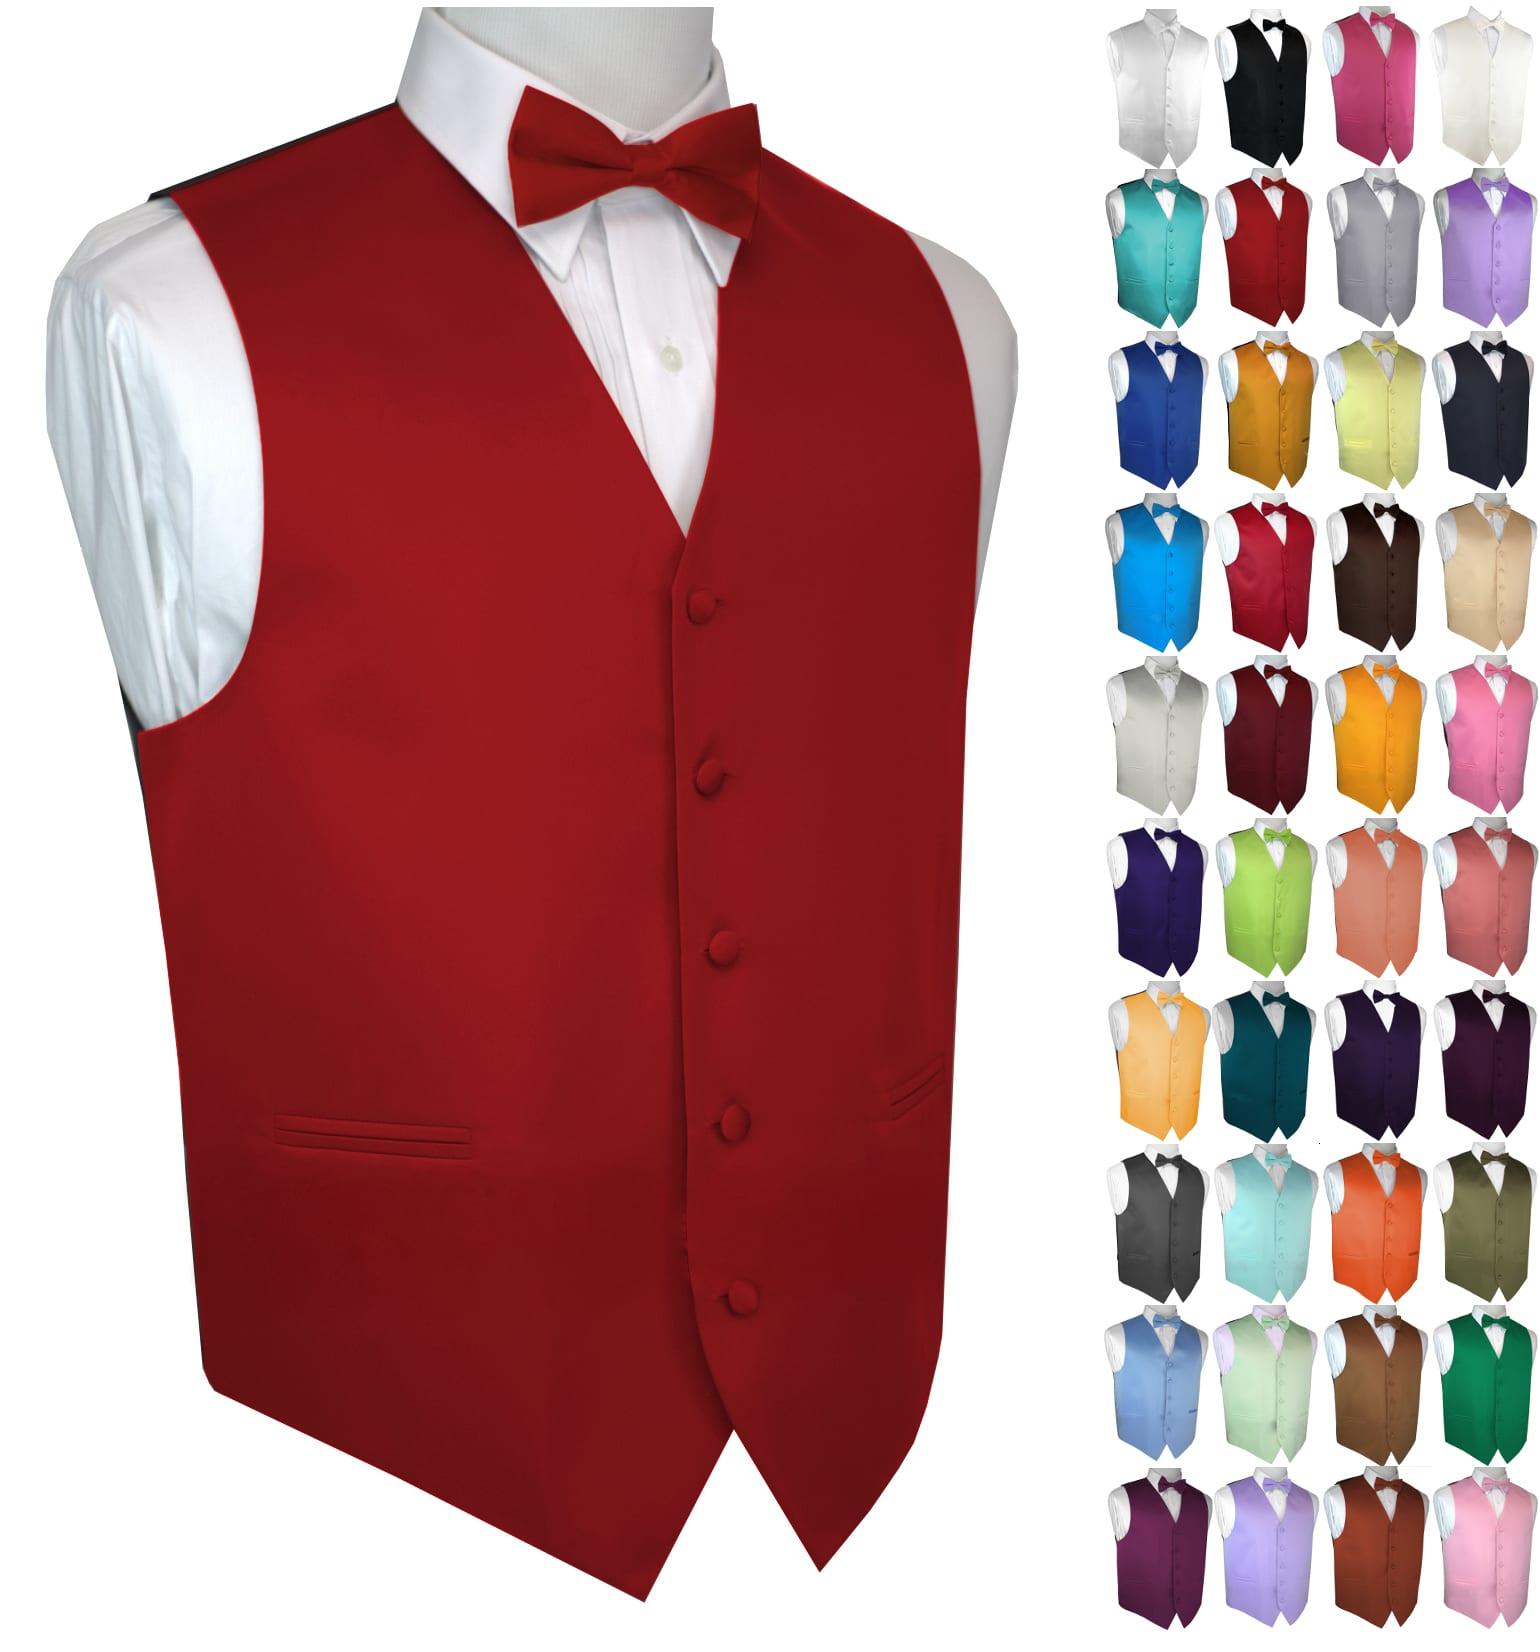 New Mens Size Berry Solid Satin Tuxedo Vest Tie Set Formal Groom Wedding Prom